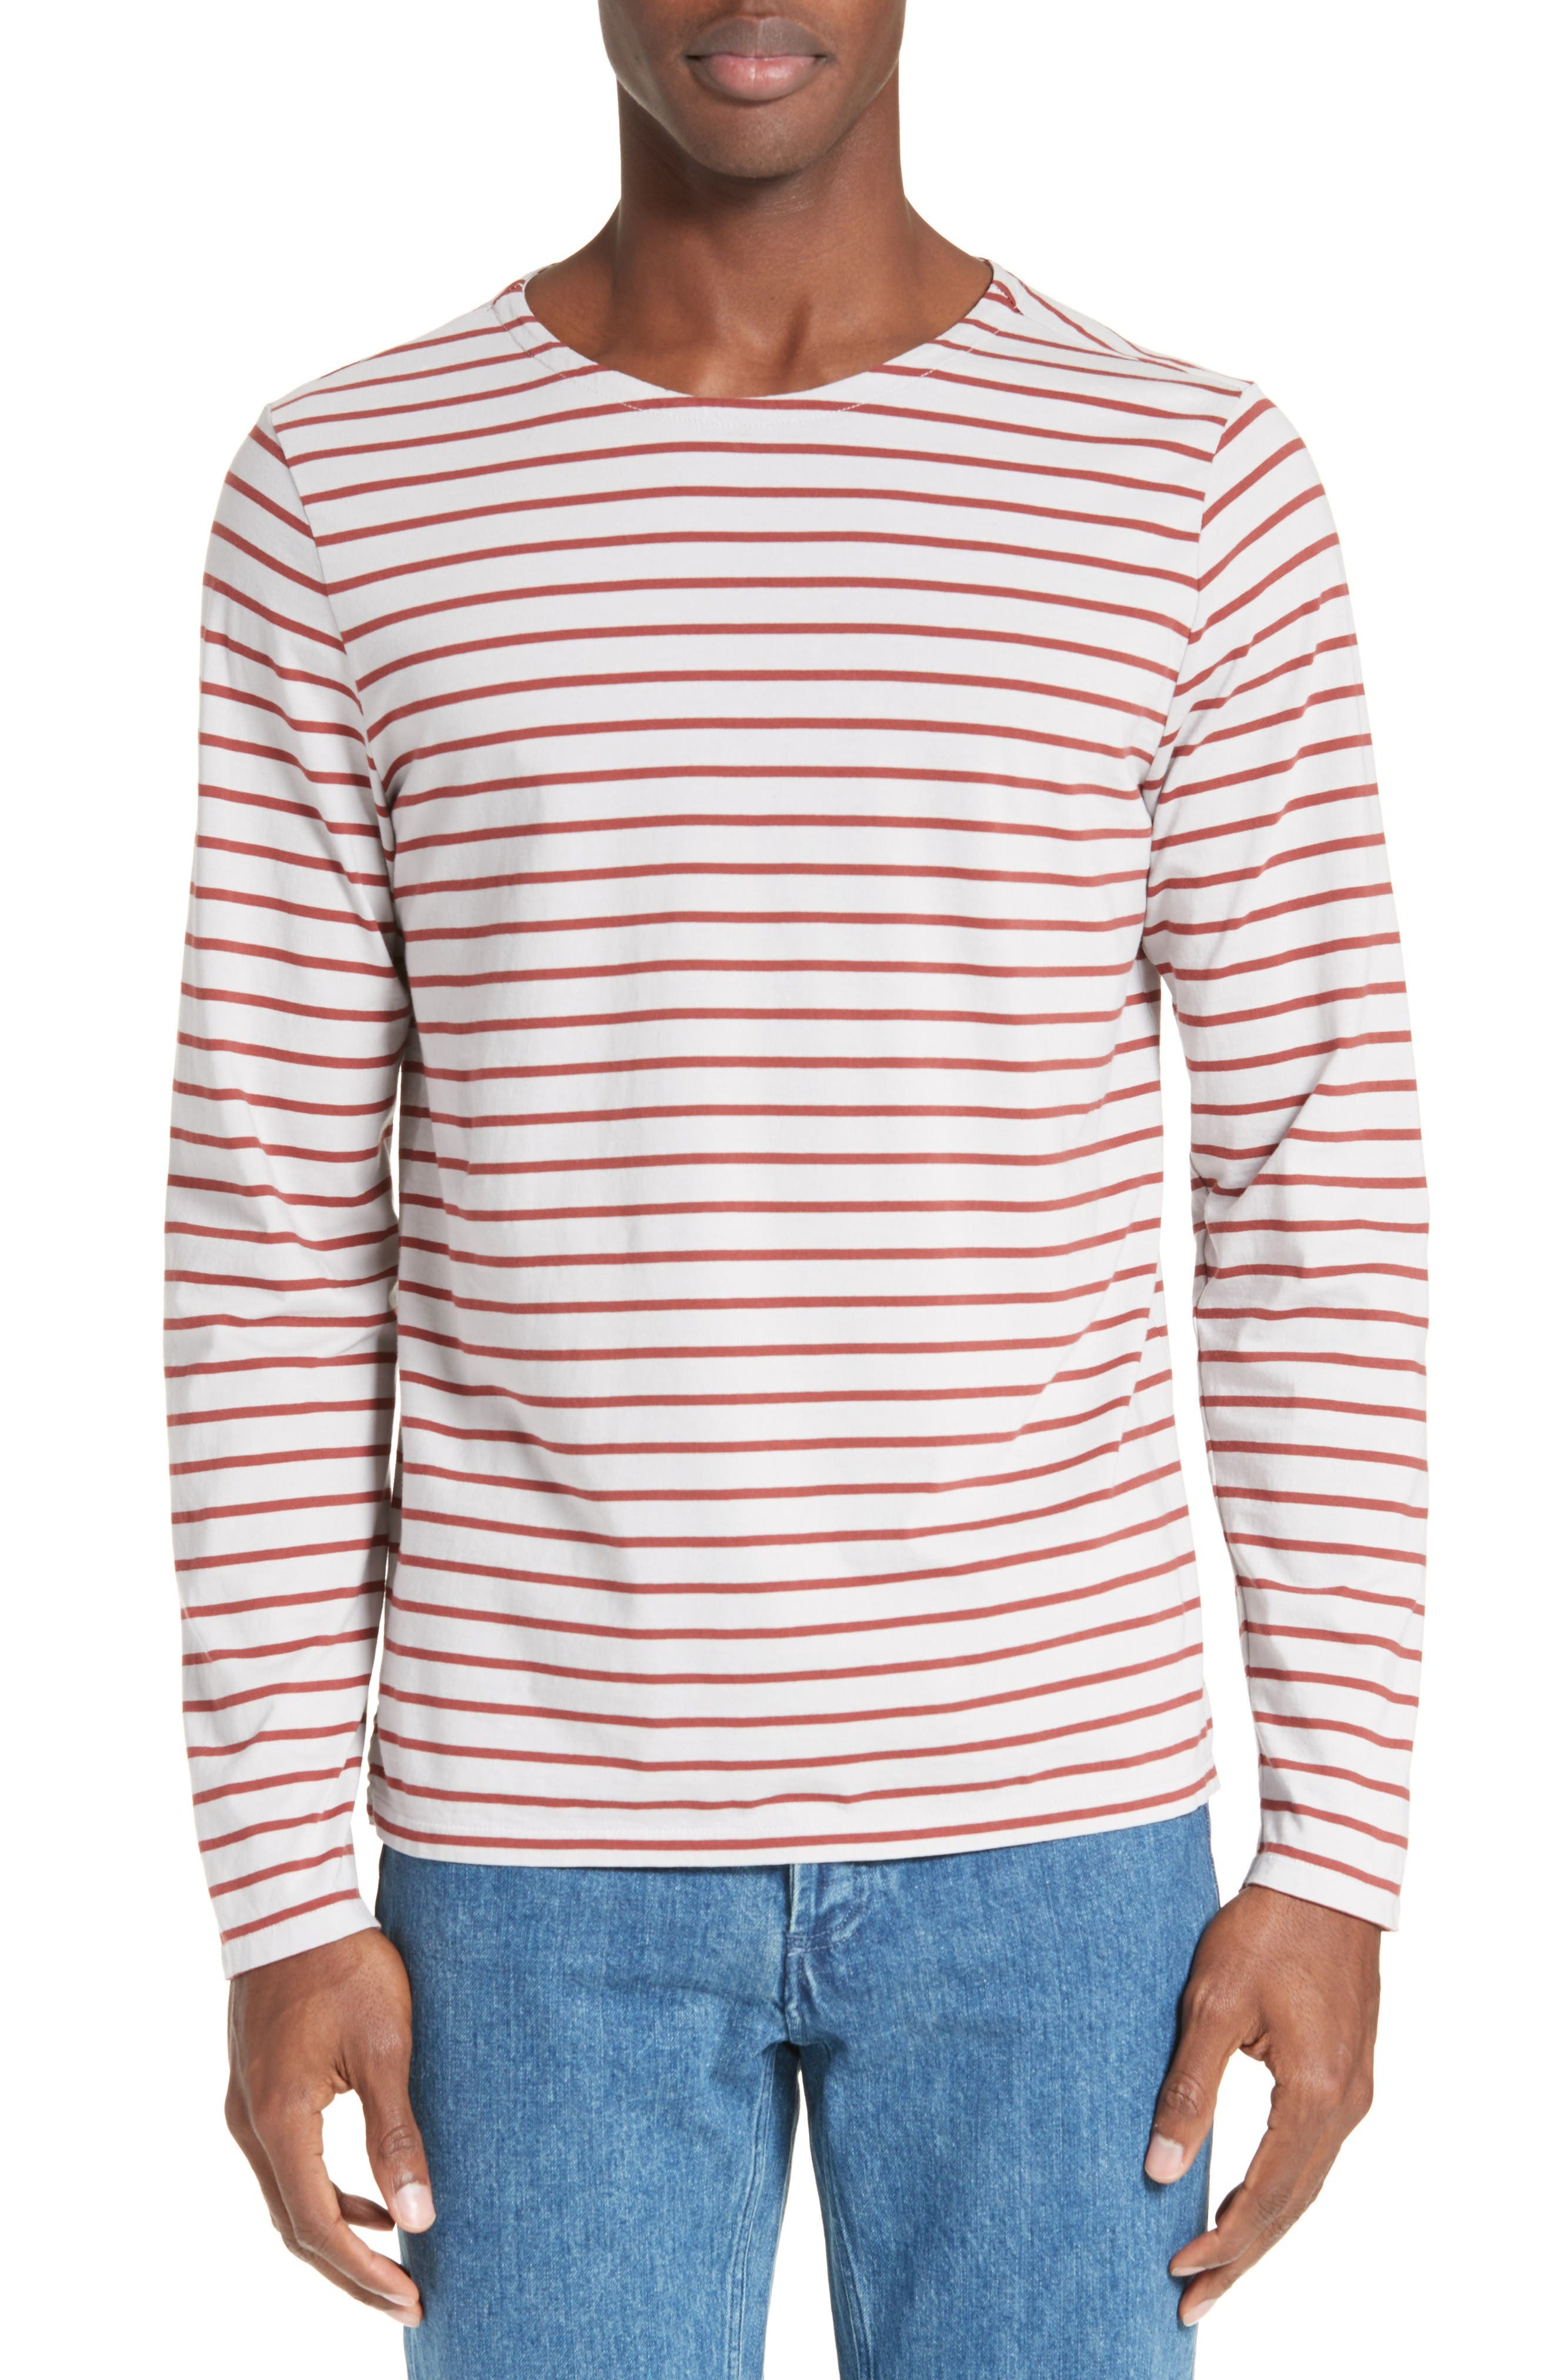 A.P.C. Joey Stripe Long Sleeve T-Shirt